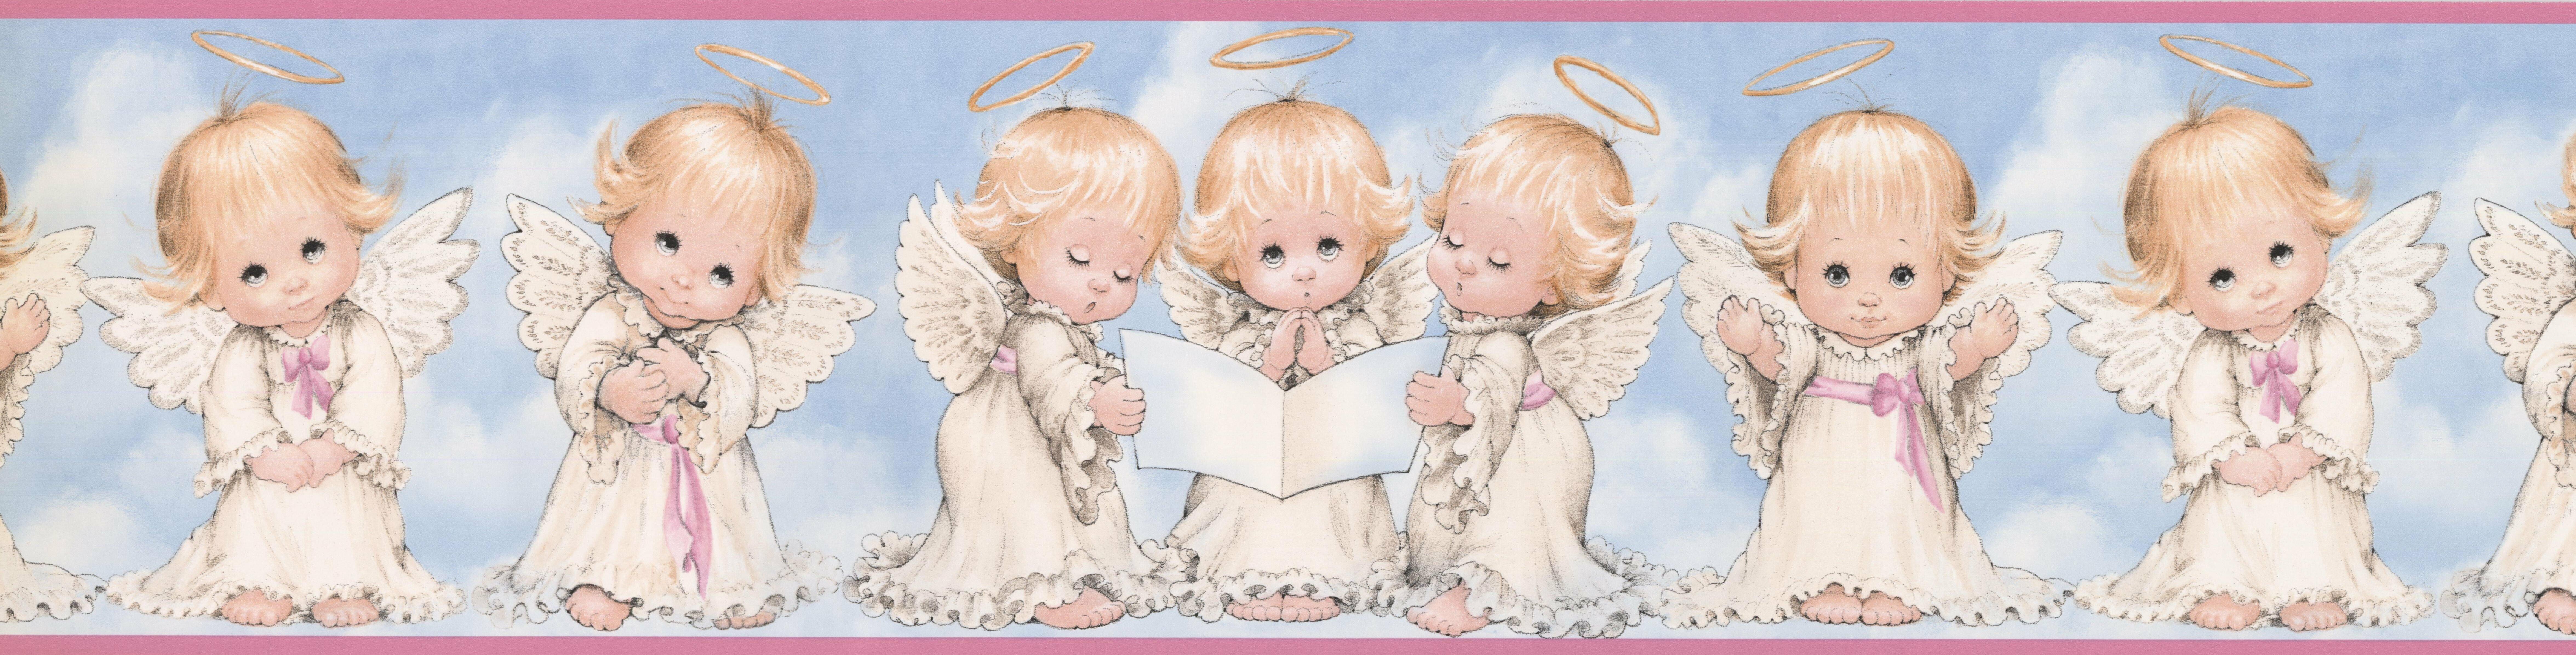 retroart angel kids baby 15' x 6.25'' wallpaper border | wayfair.ca